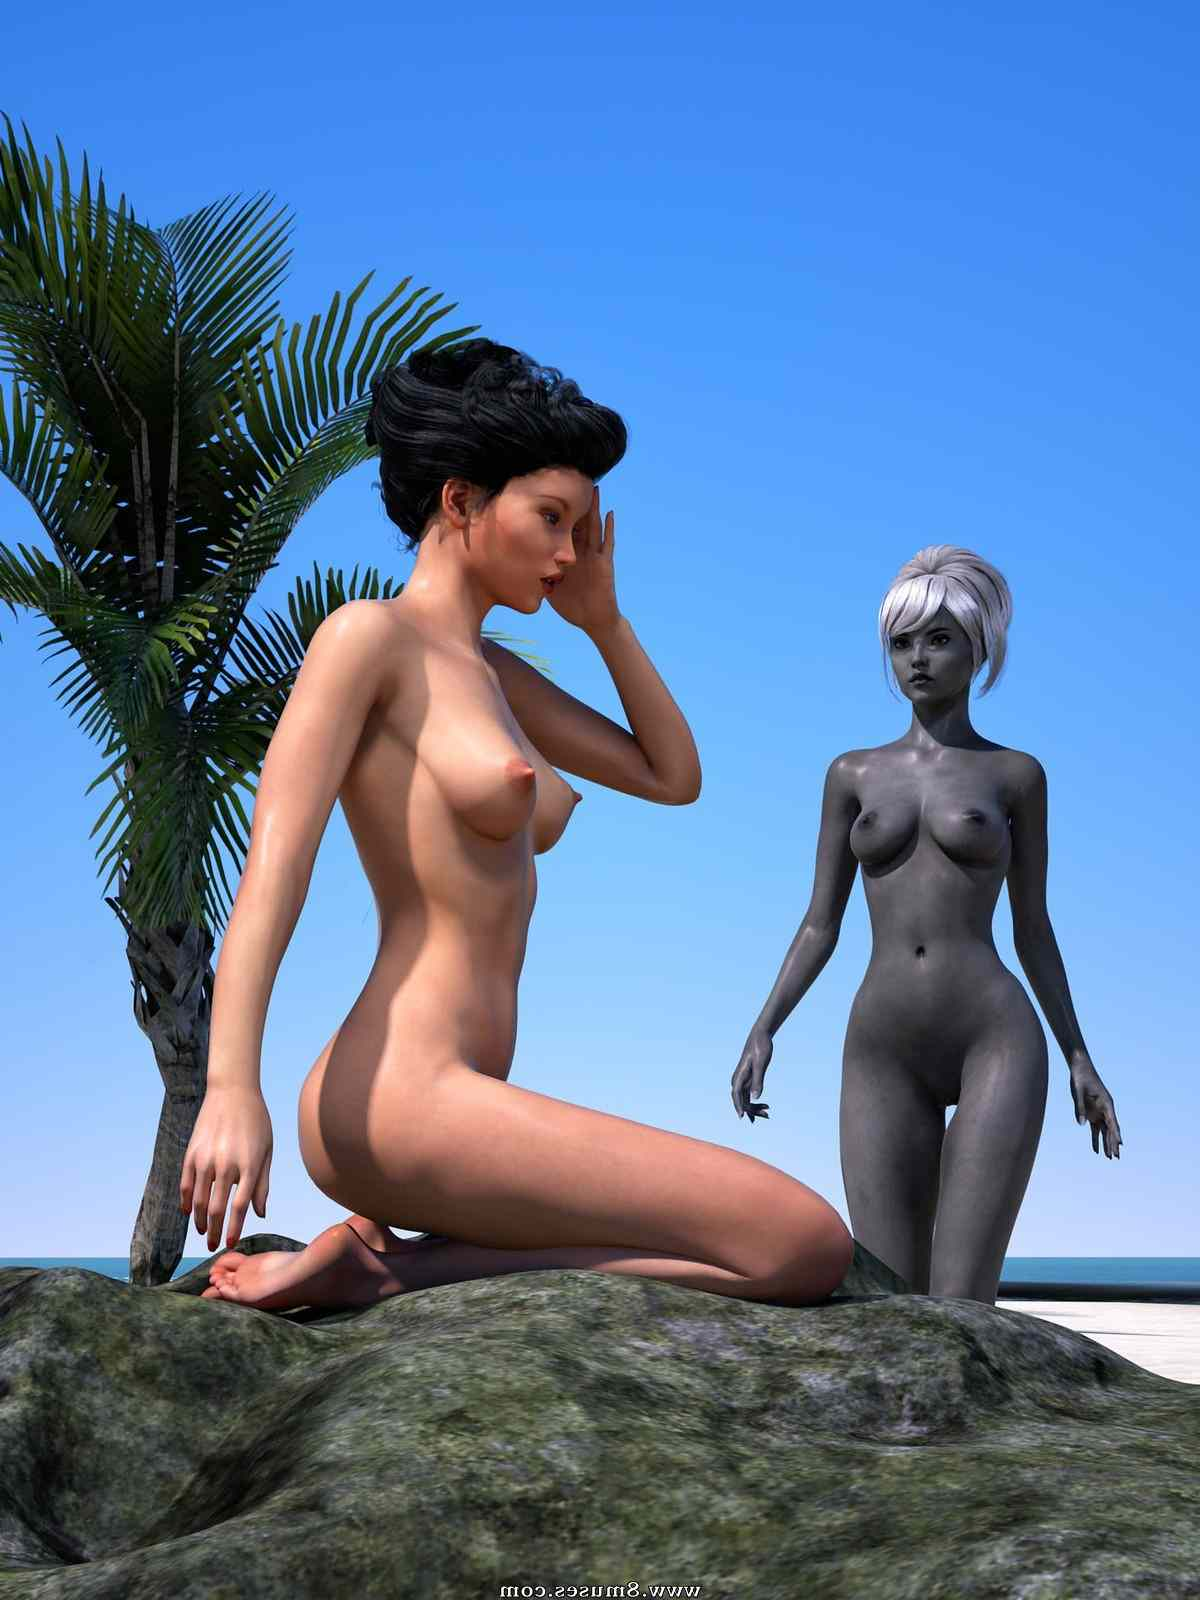 sorceress lori beach day part porn comics